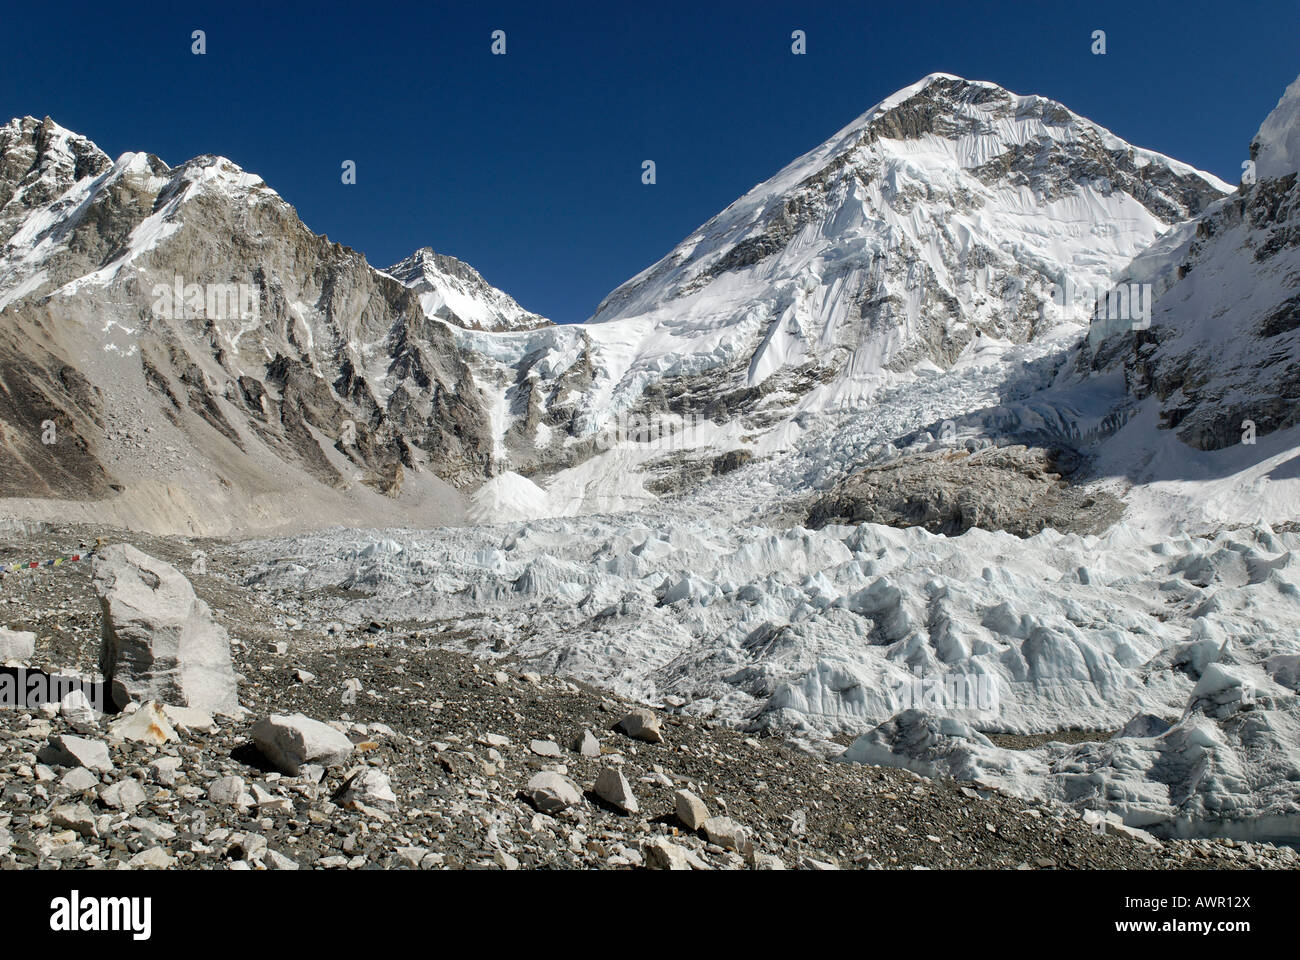 View from Everest Base Camp over Khumbu glacier towards Khumbu Icefall, Khumbu Himal, Sagarmatha National Park, - Stock Image